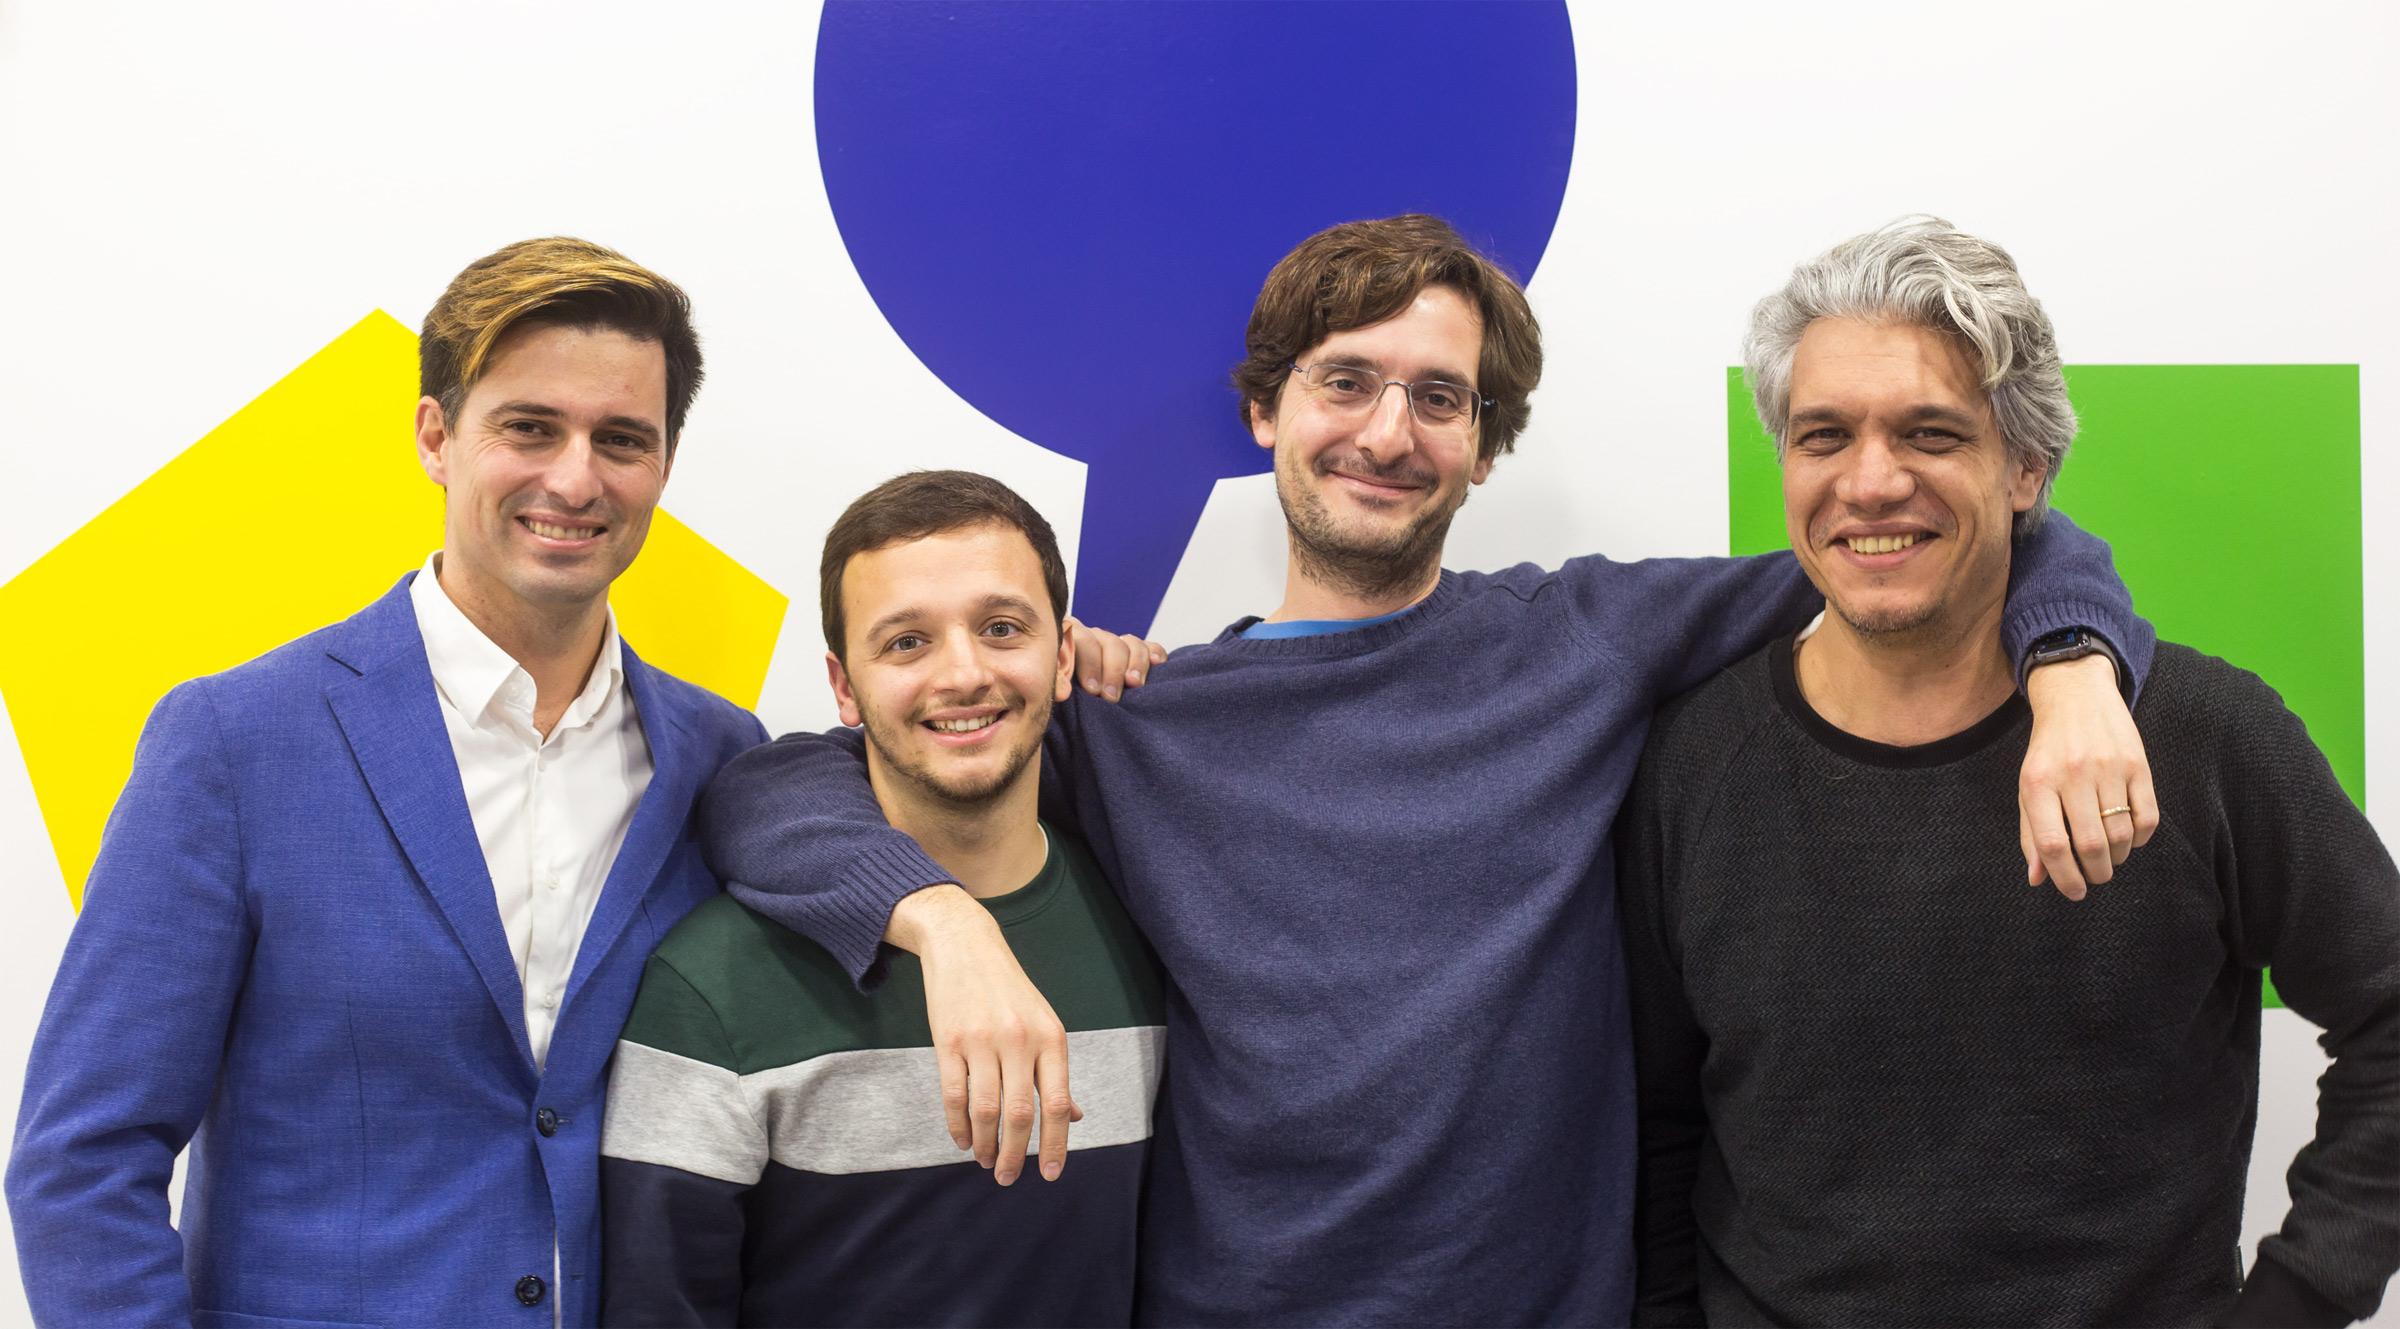 Unbabel raises $23M for its 'AI-powered, human-refined' translation platform